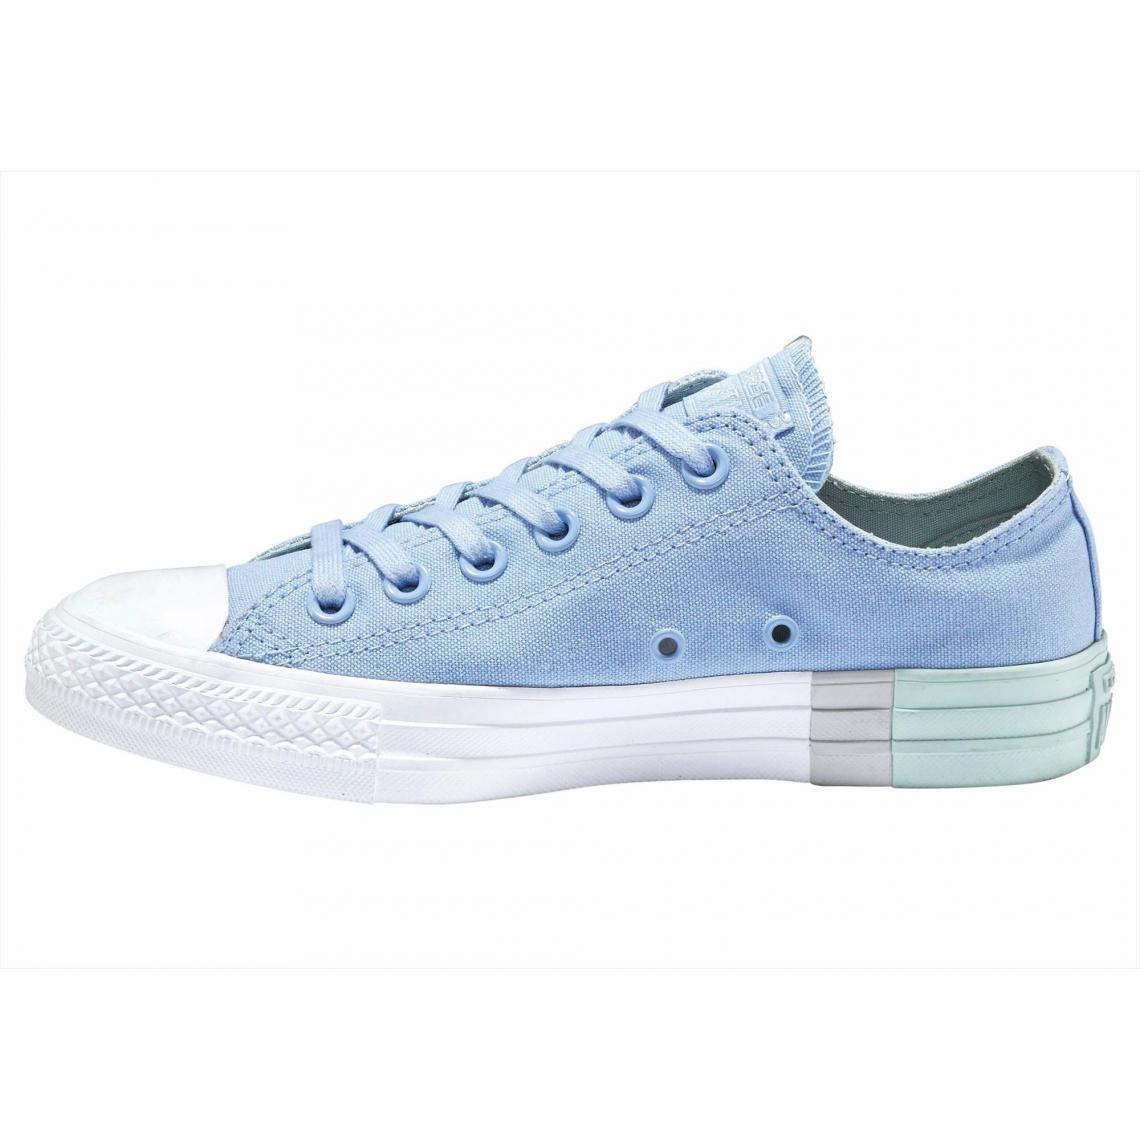 f6f77aeeb14fa Sneakers Converse Cliquez l image pour l agrandir. Baskets basses femme Converse  Chuck Taylor All Star Ox ...